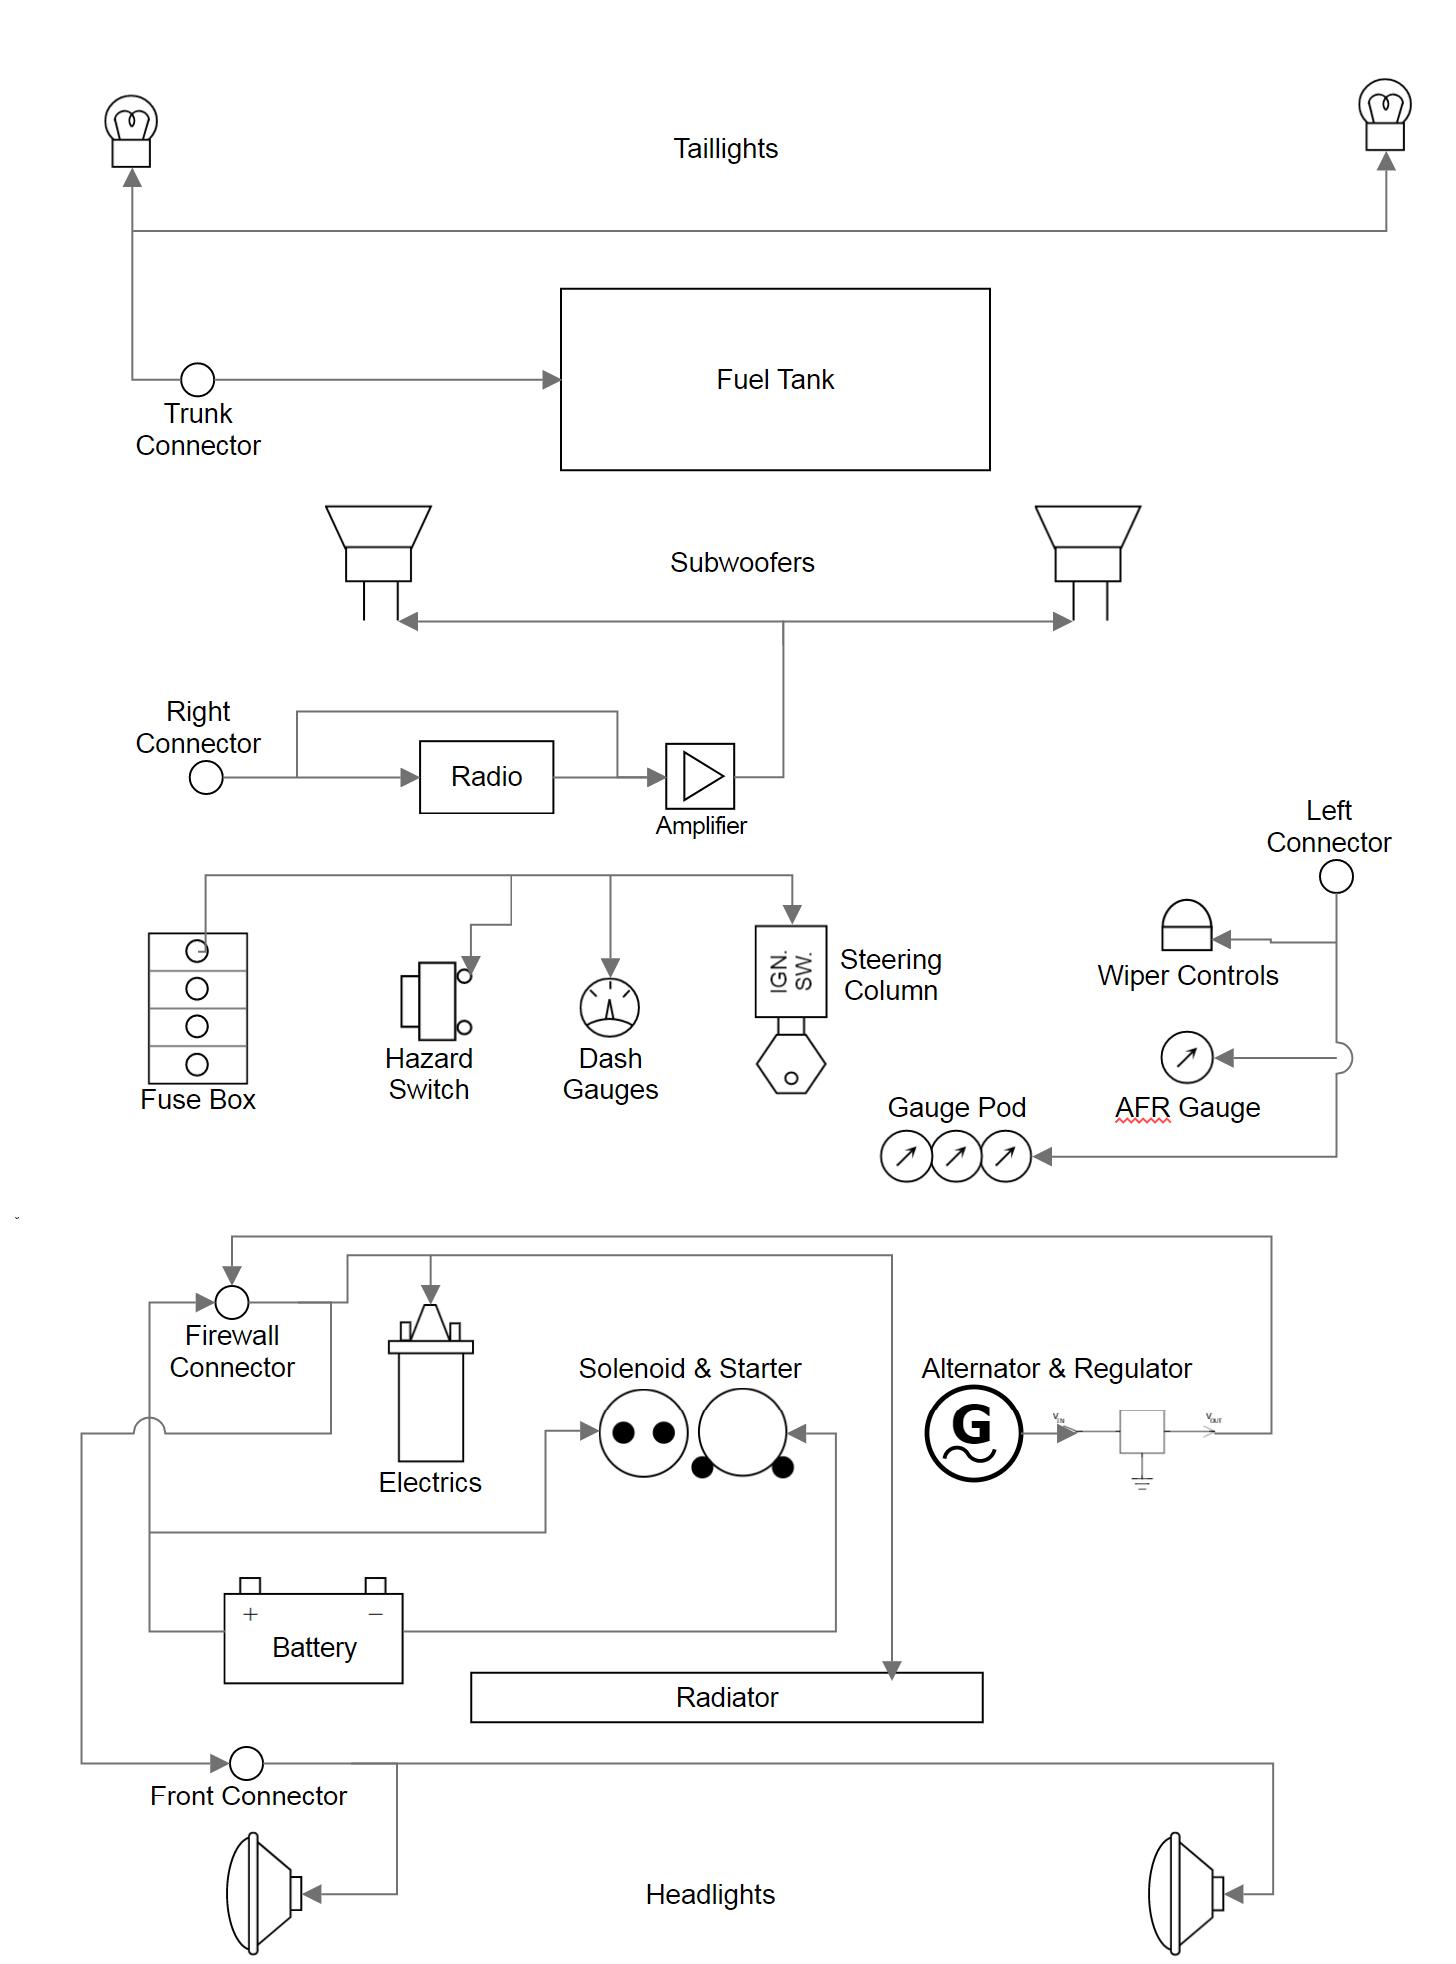 hight resolution of omg wiring diagram wiring diagram expertomg wiring diagram wiring diagram technic omg wiring diagram